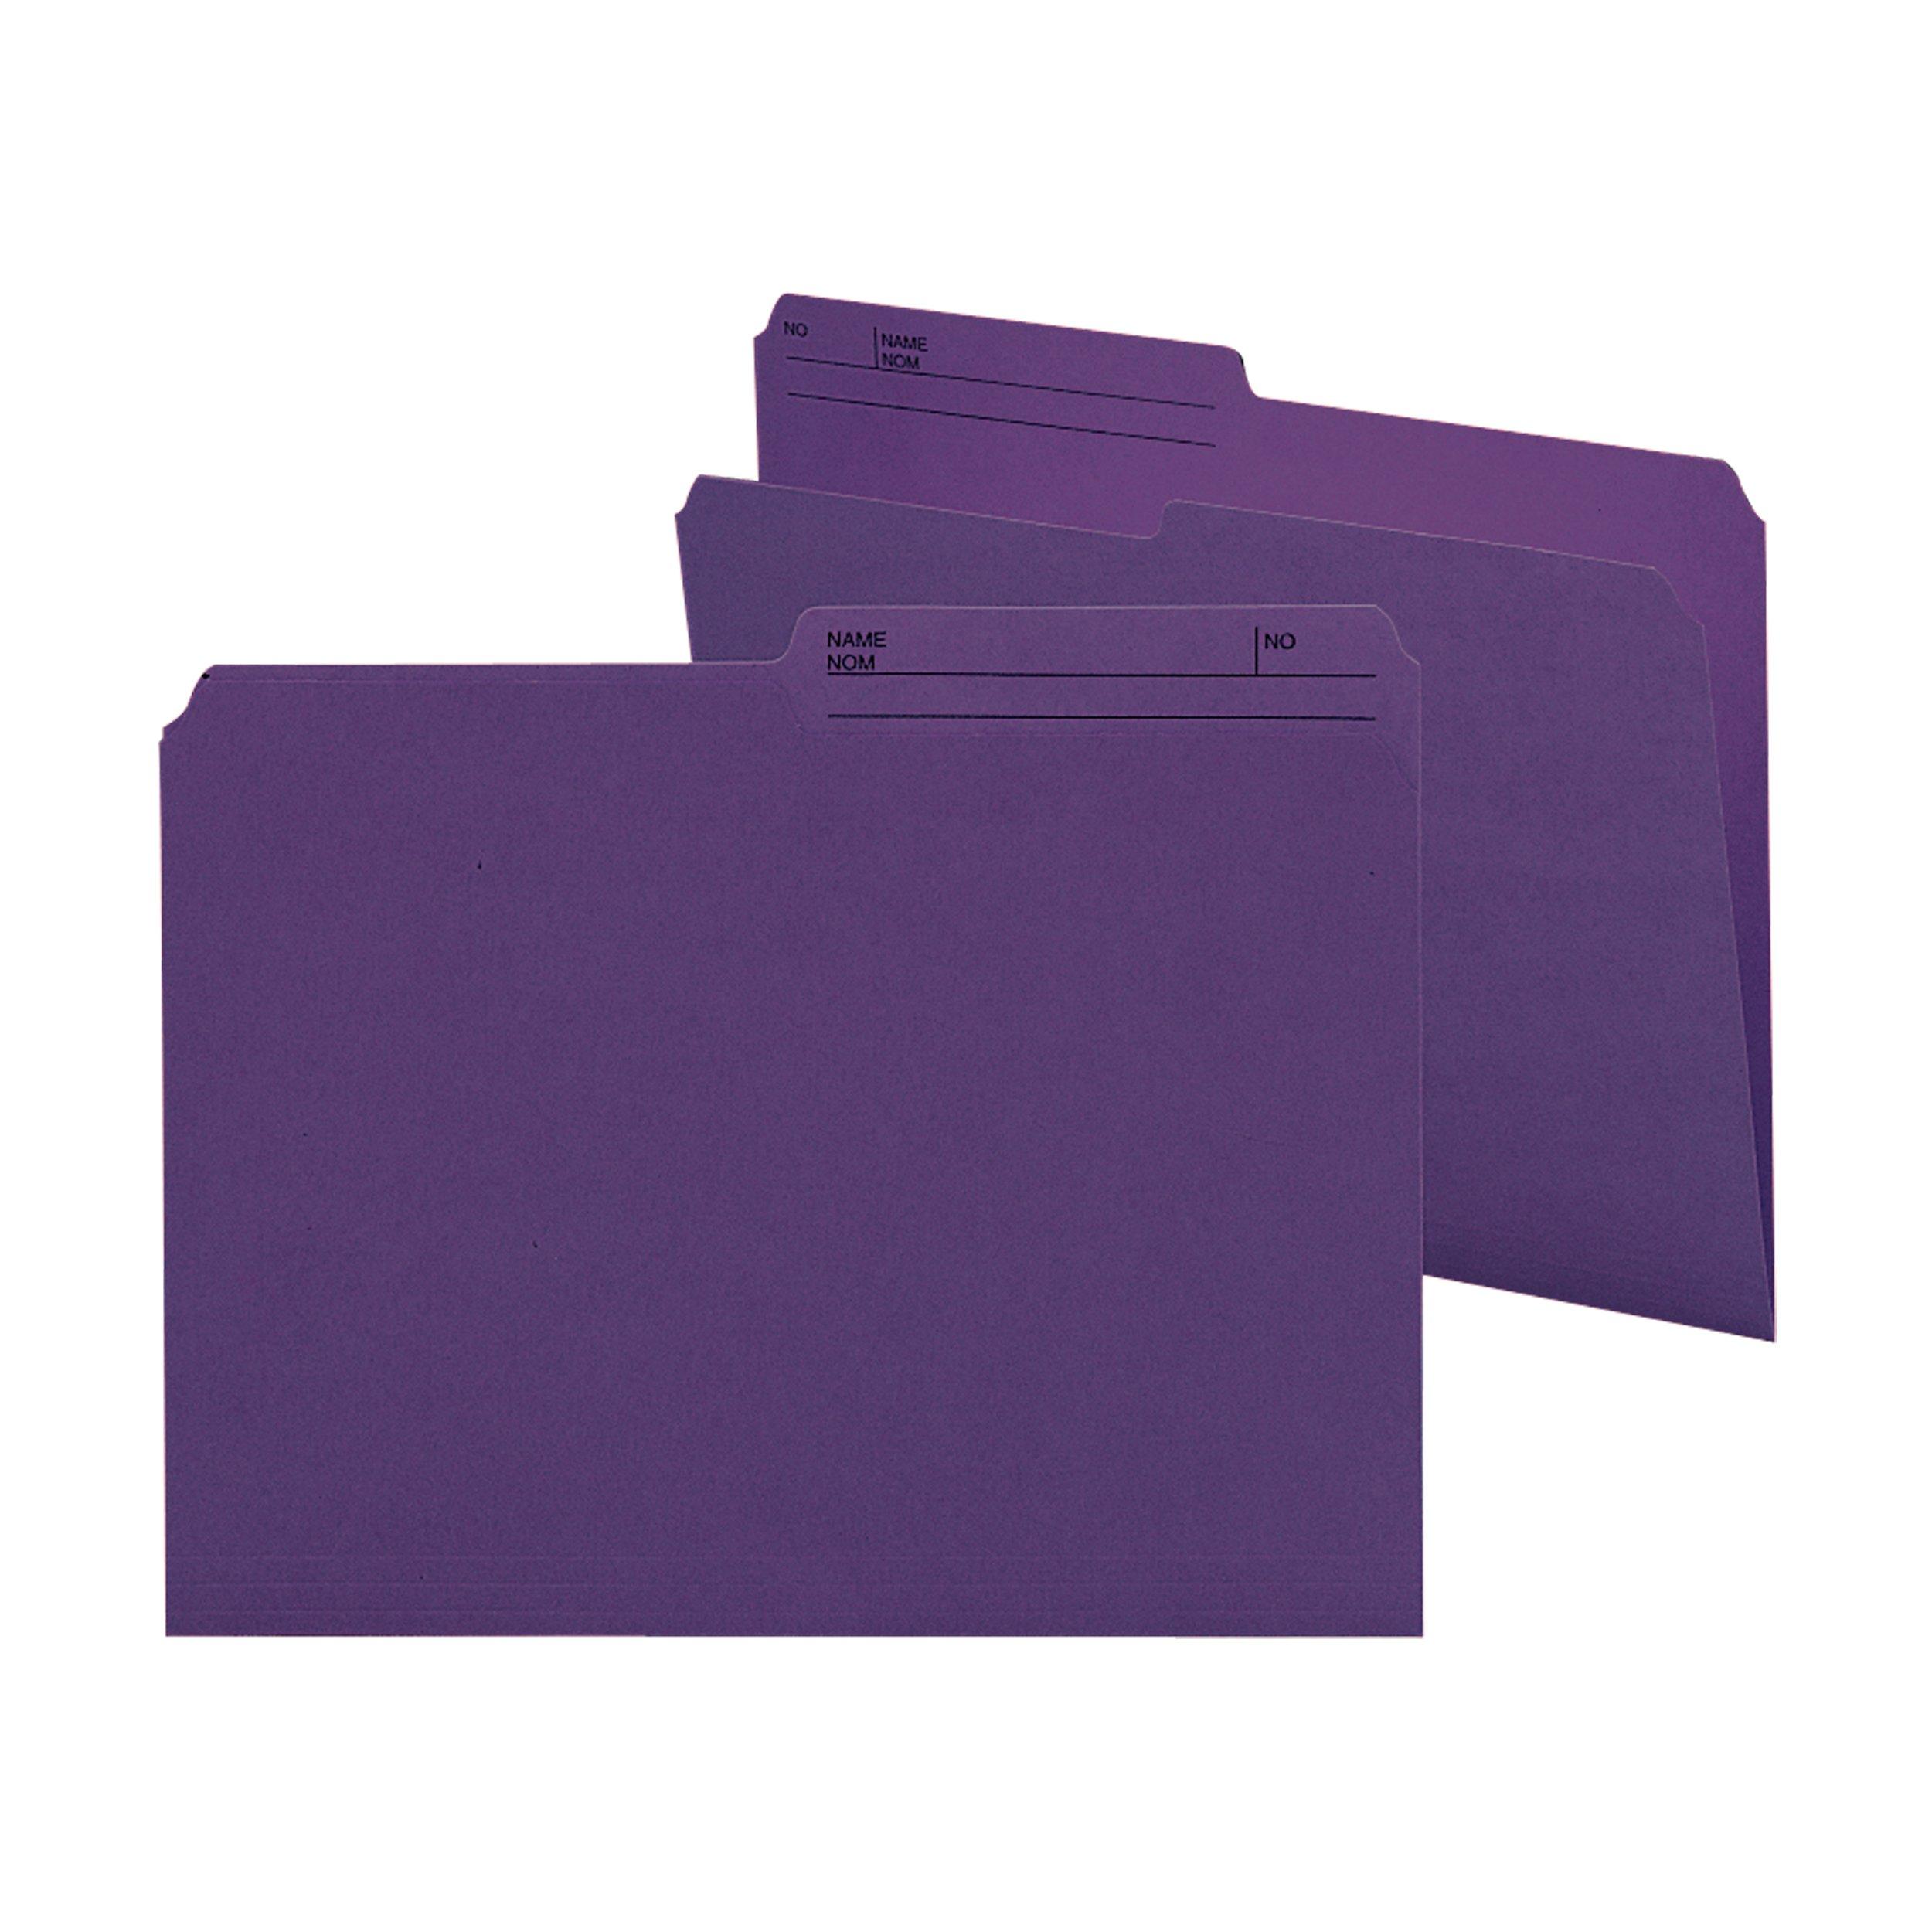 Smead Reversible File Folder, 1/2-Cut Printed Tab, Letter Size, Purple, 100 per Box (10378)